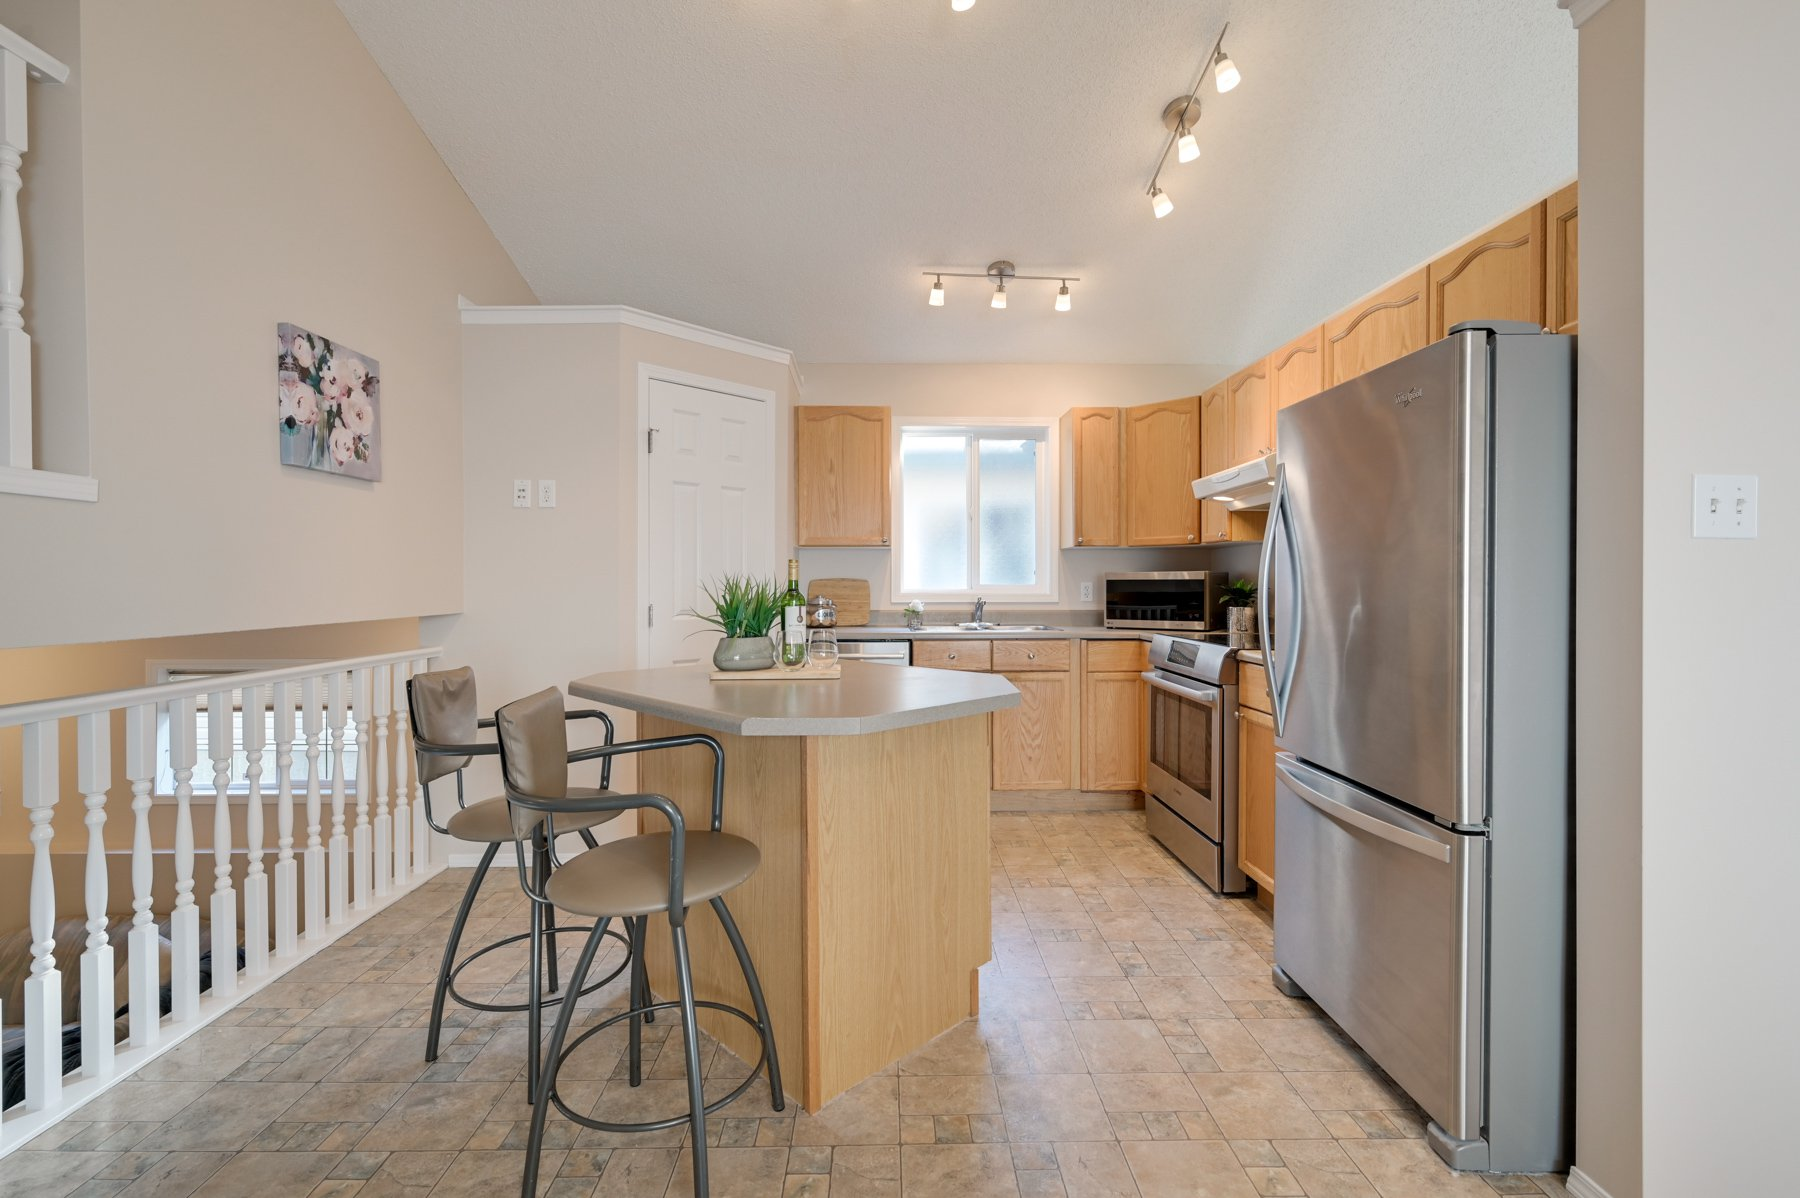 Main Photo: 4540 Turner Square: Edmonton House for sale : MLS®# E4174372